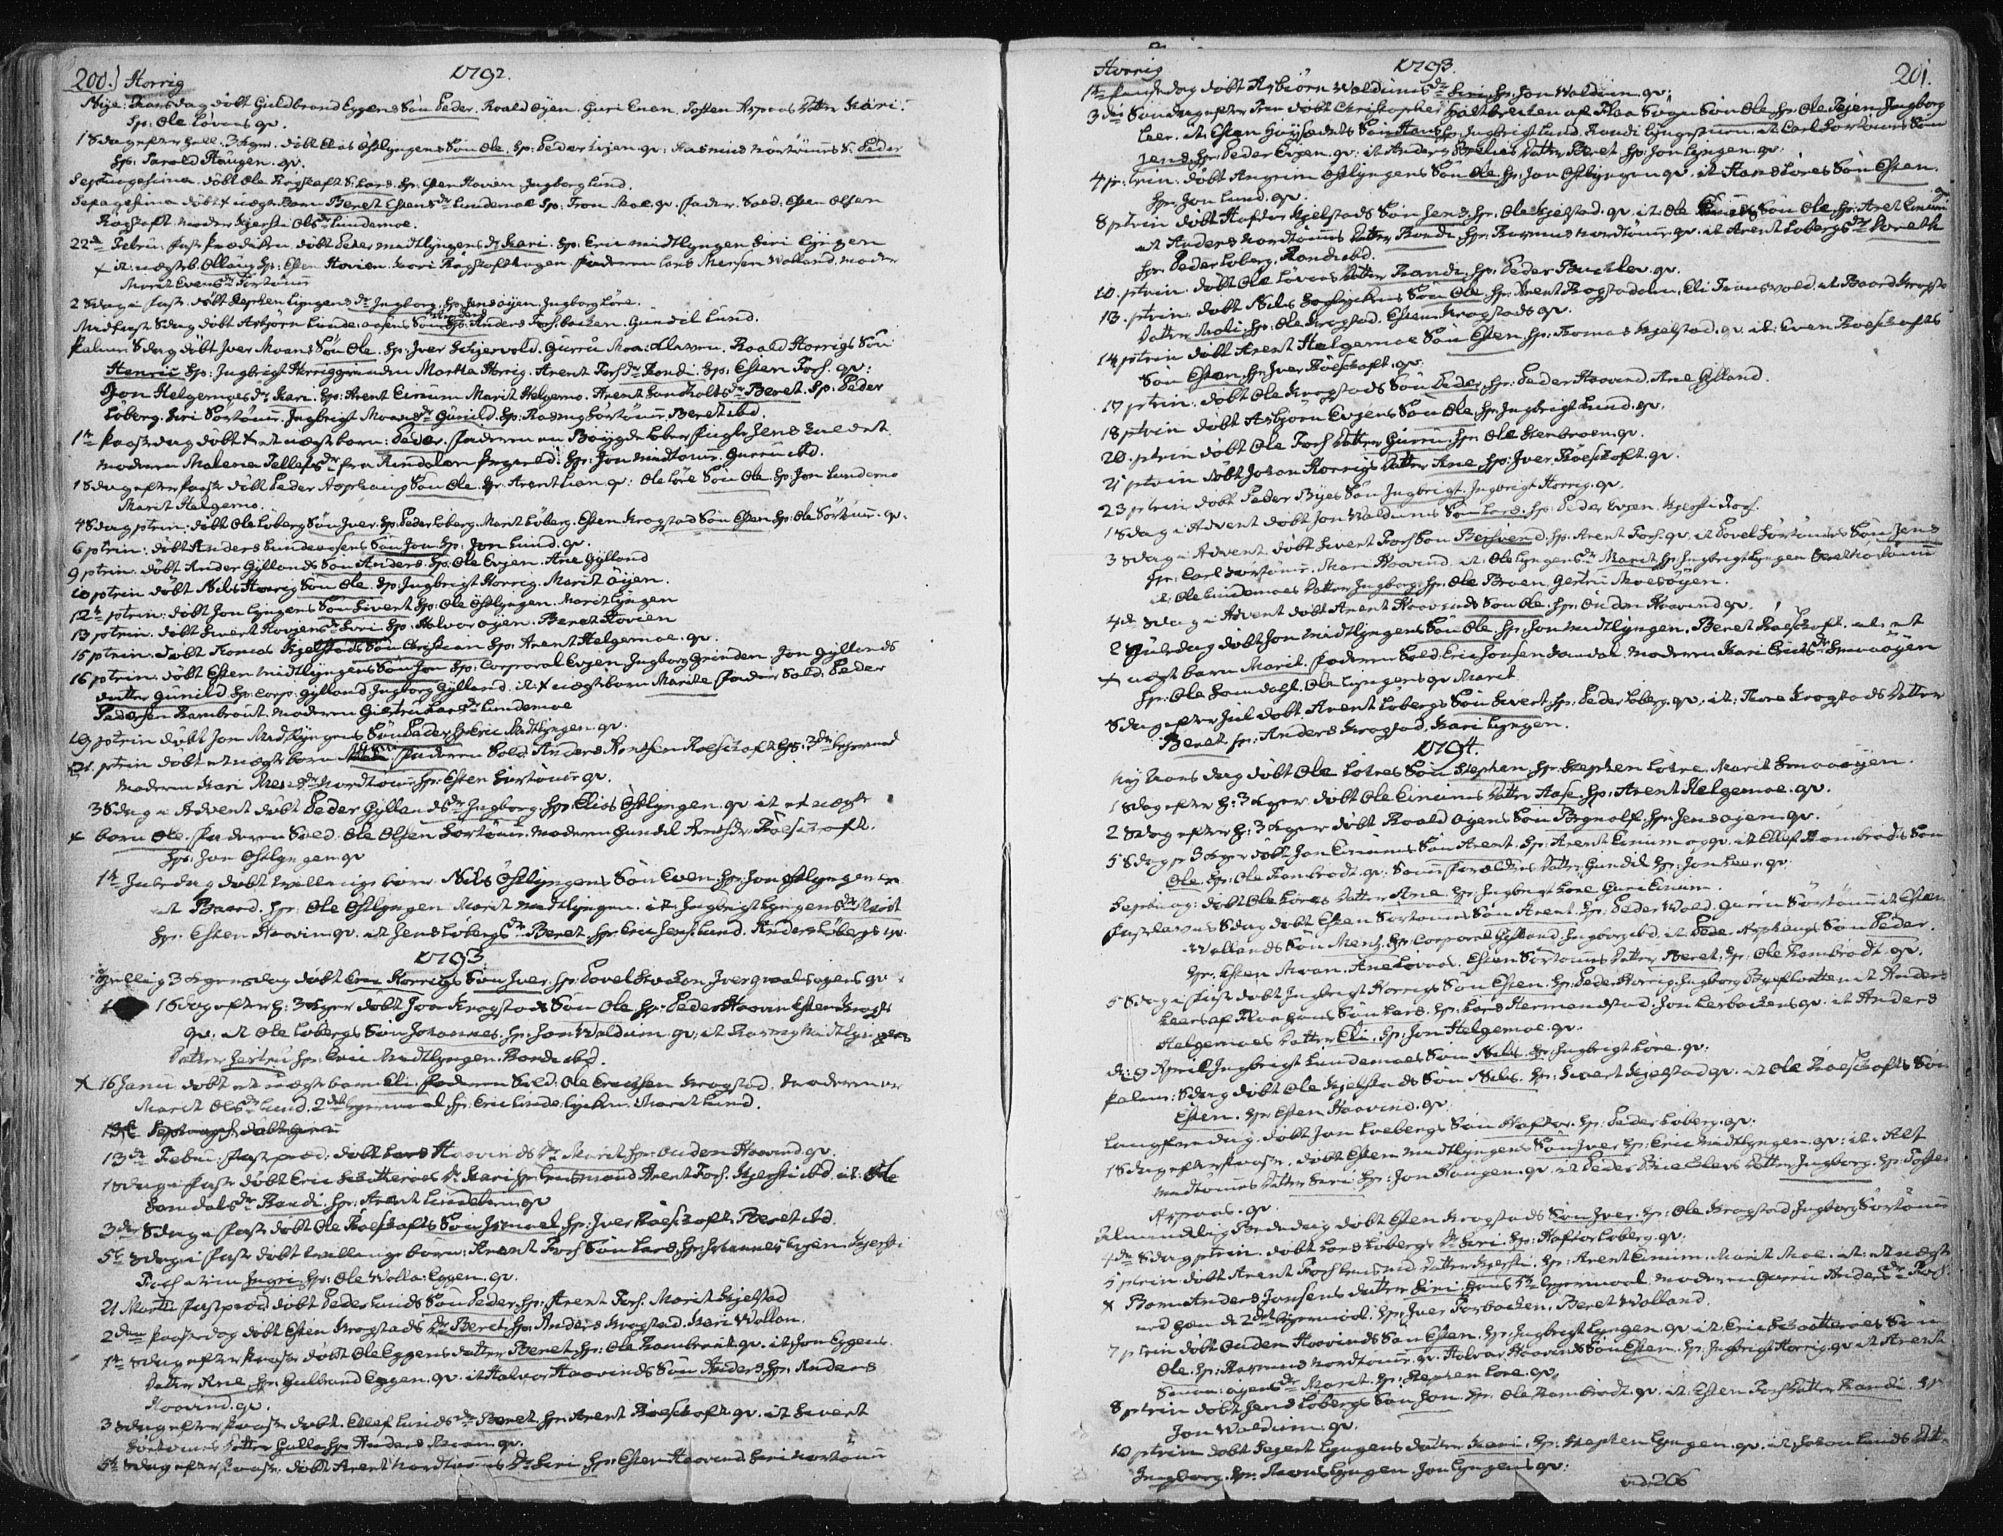 SAT, Ministerialprotokoller, klokkerbøker og fødselsregistre - Sør-Trøndelag, 687/L0992: Parish register (official) no. 687A03 /1, 1788-1815, p. 200-201